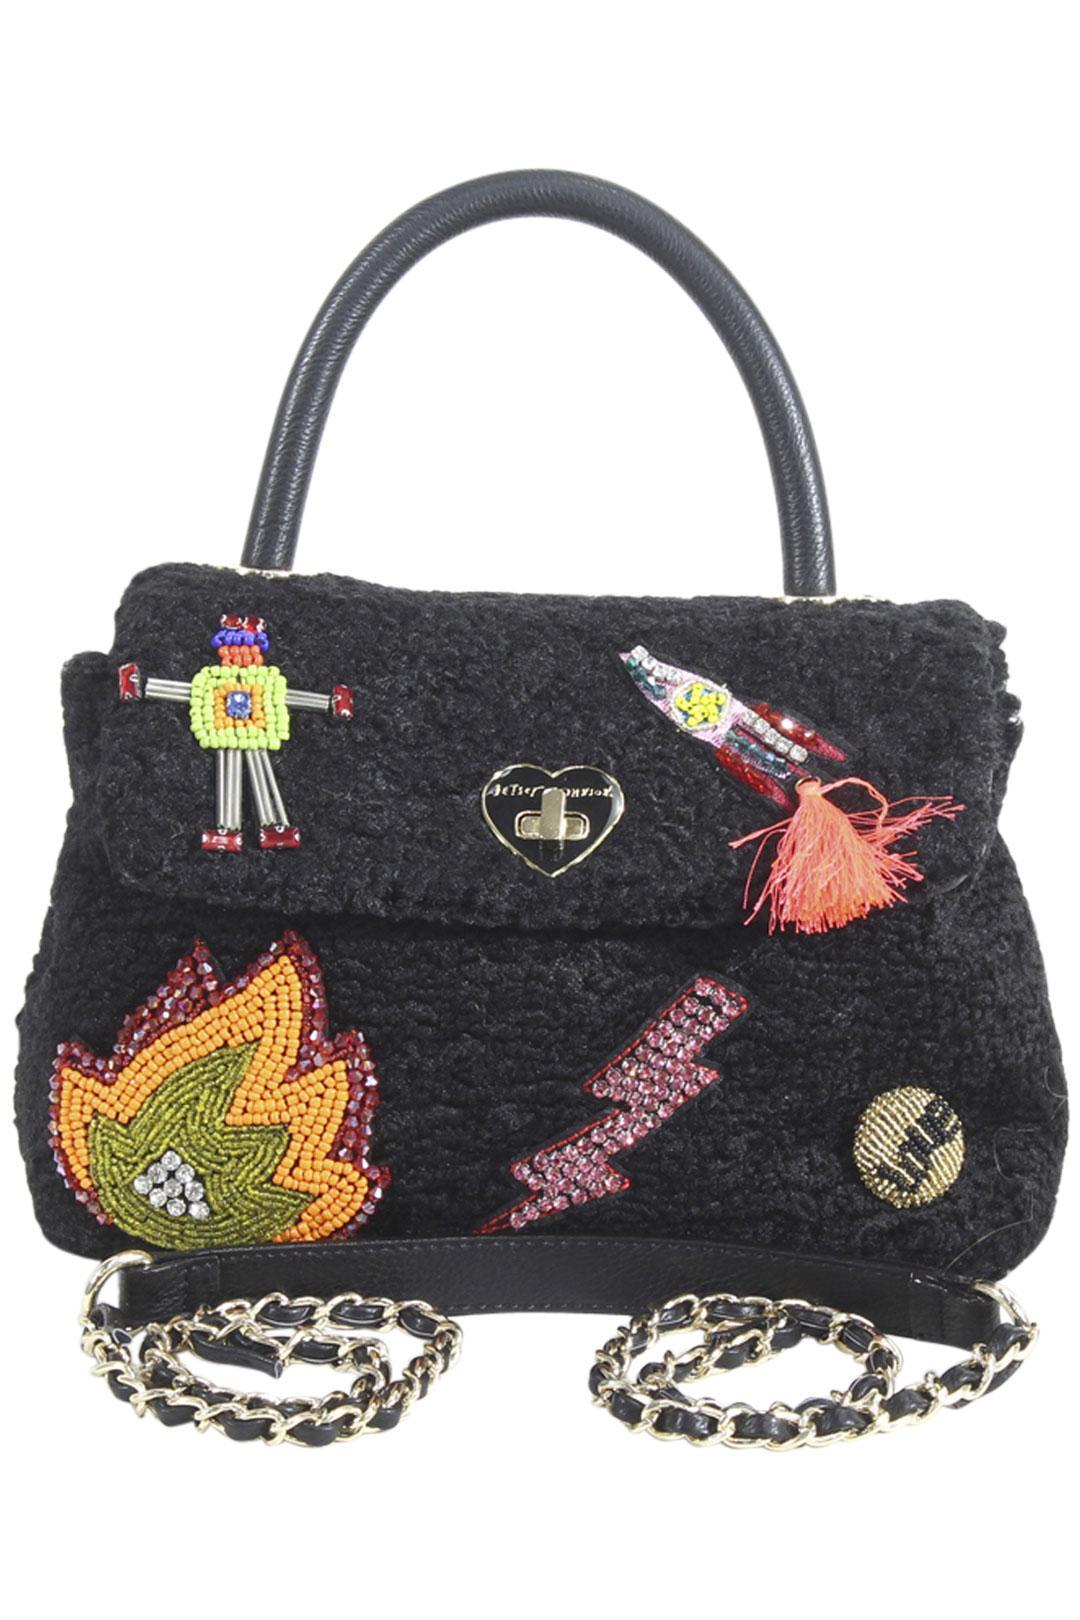 Image of Betsey Johnson Women's Curly Gurl Top Handle Crossbody Handbag - Black